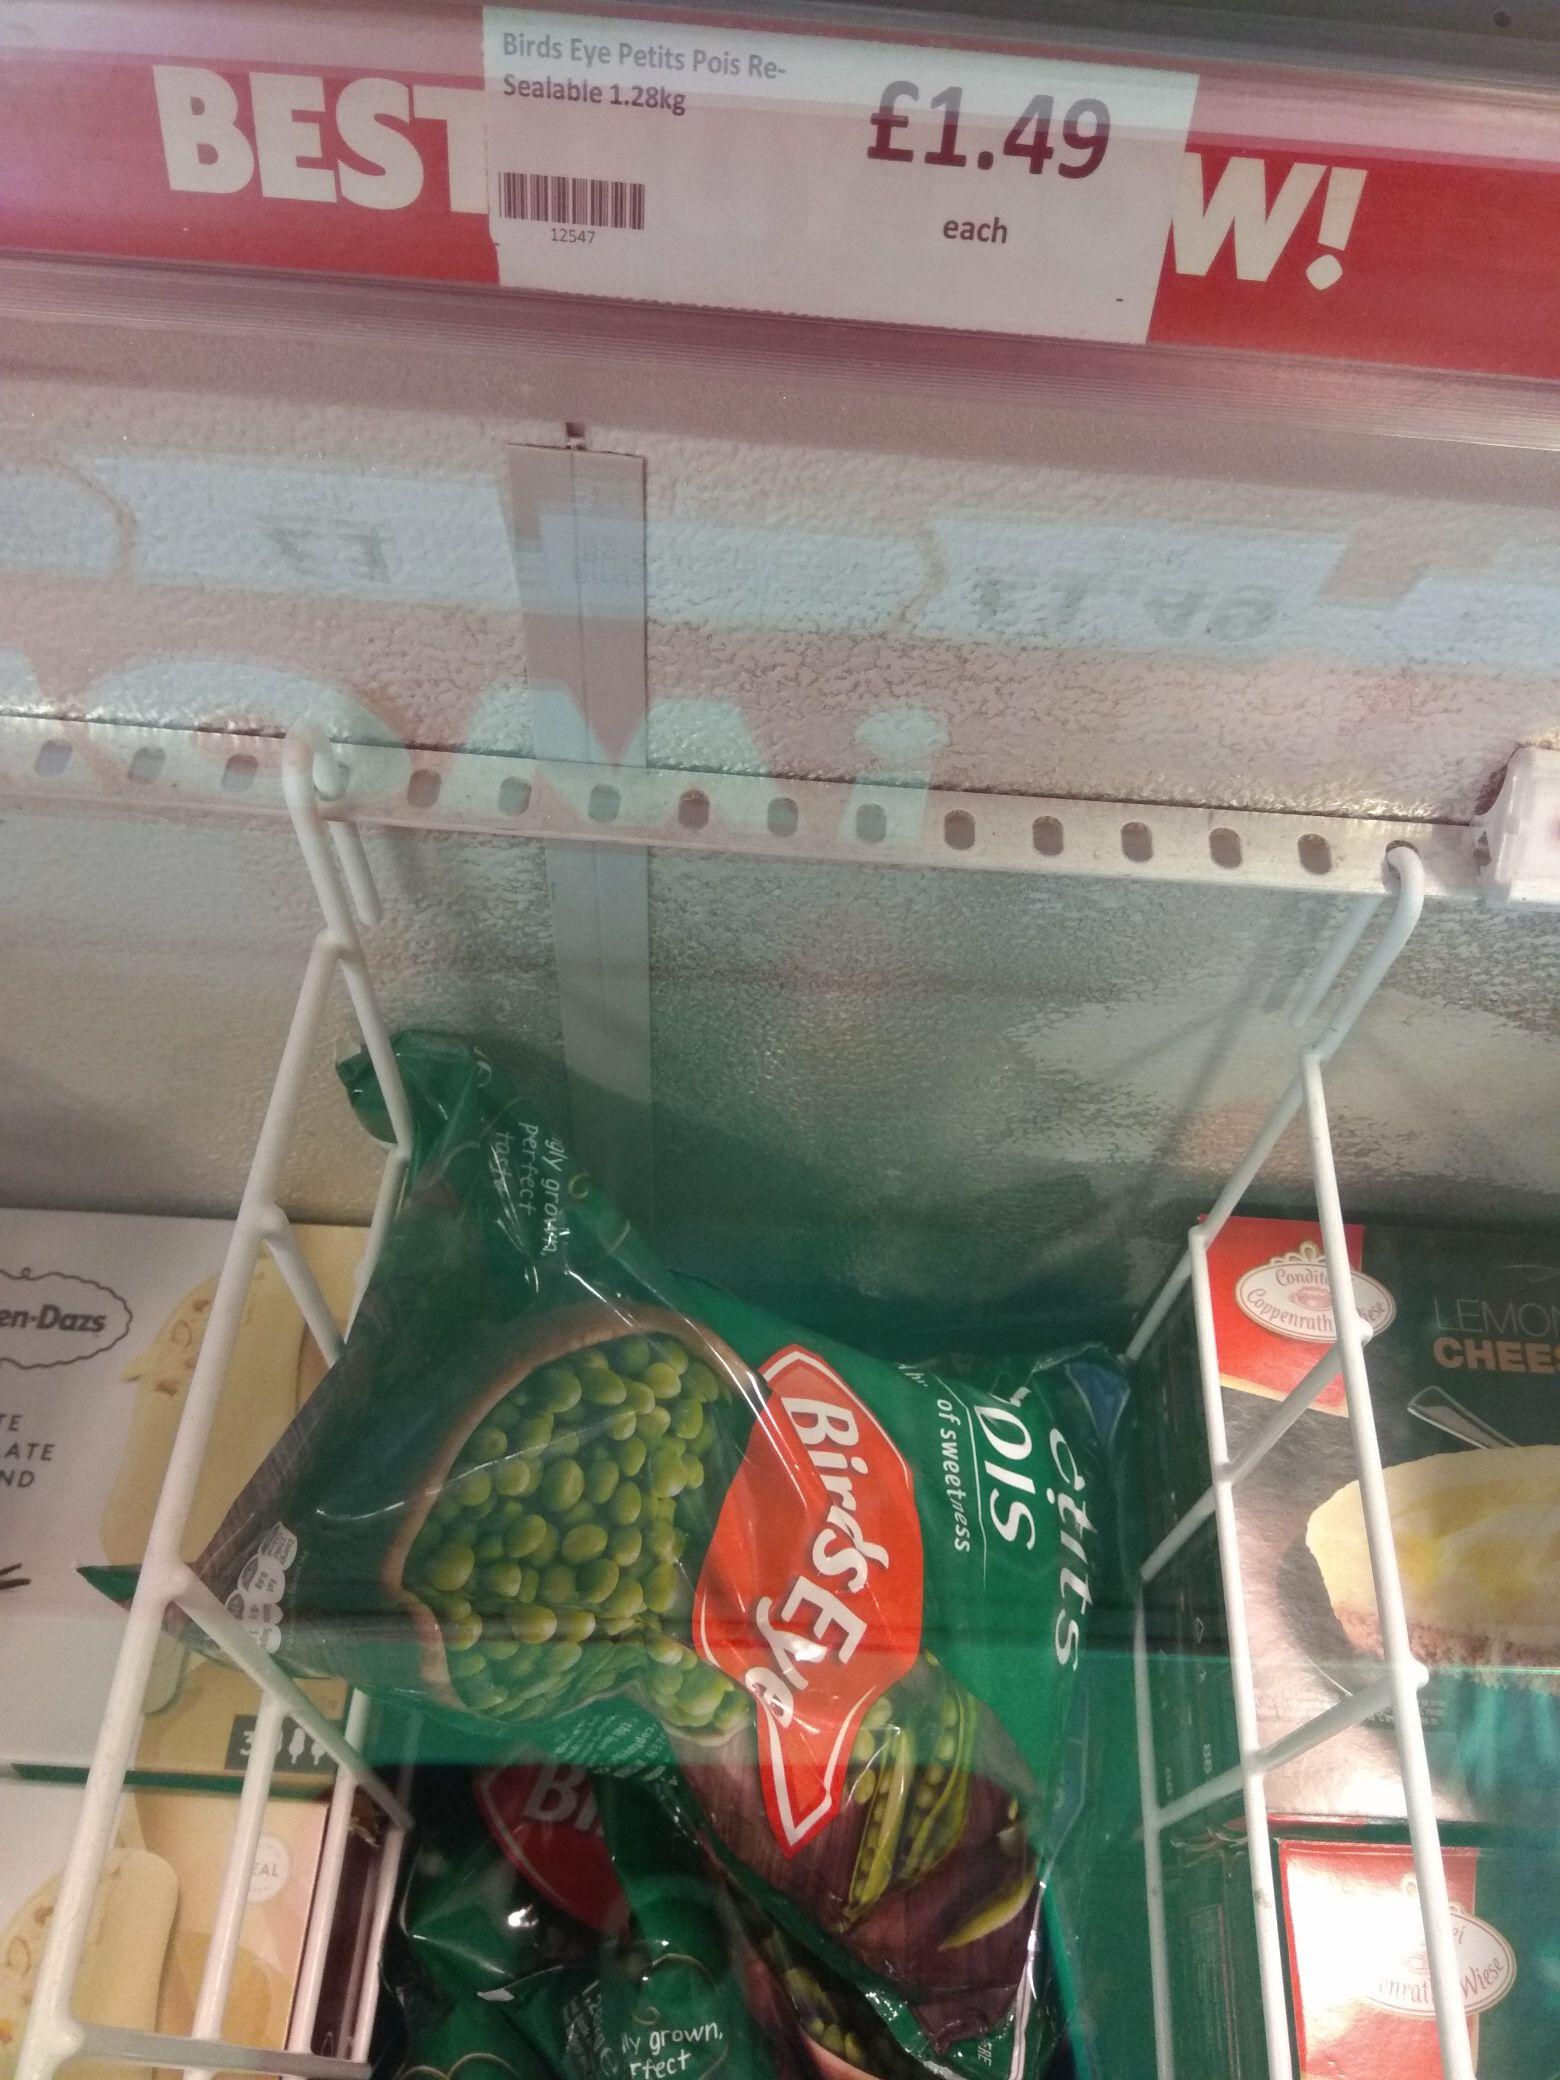 Birds Eye Petits Pois 1.28kg resealable pack  £1.49 @ Heron foods